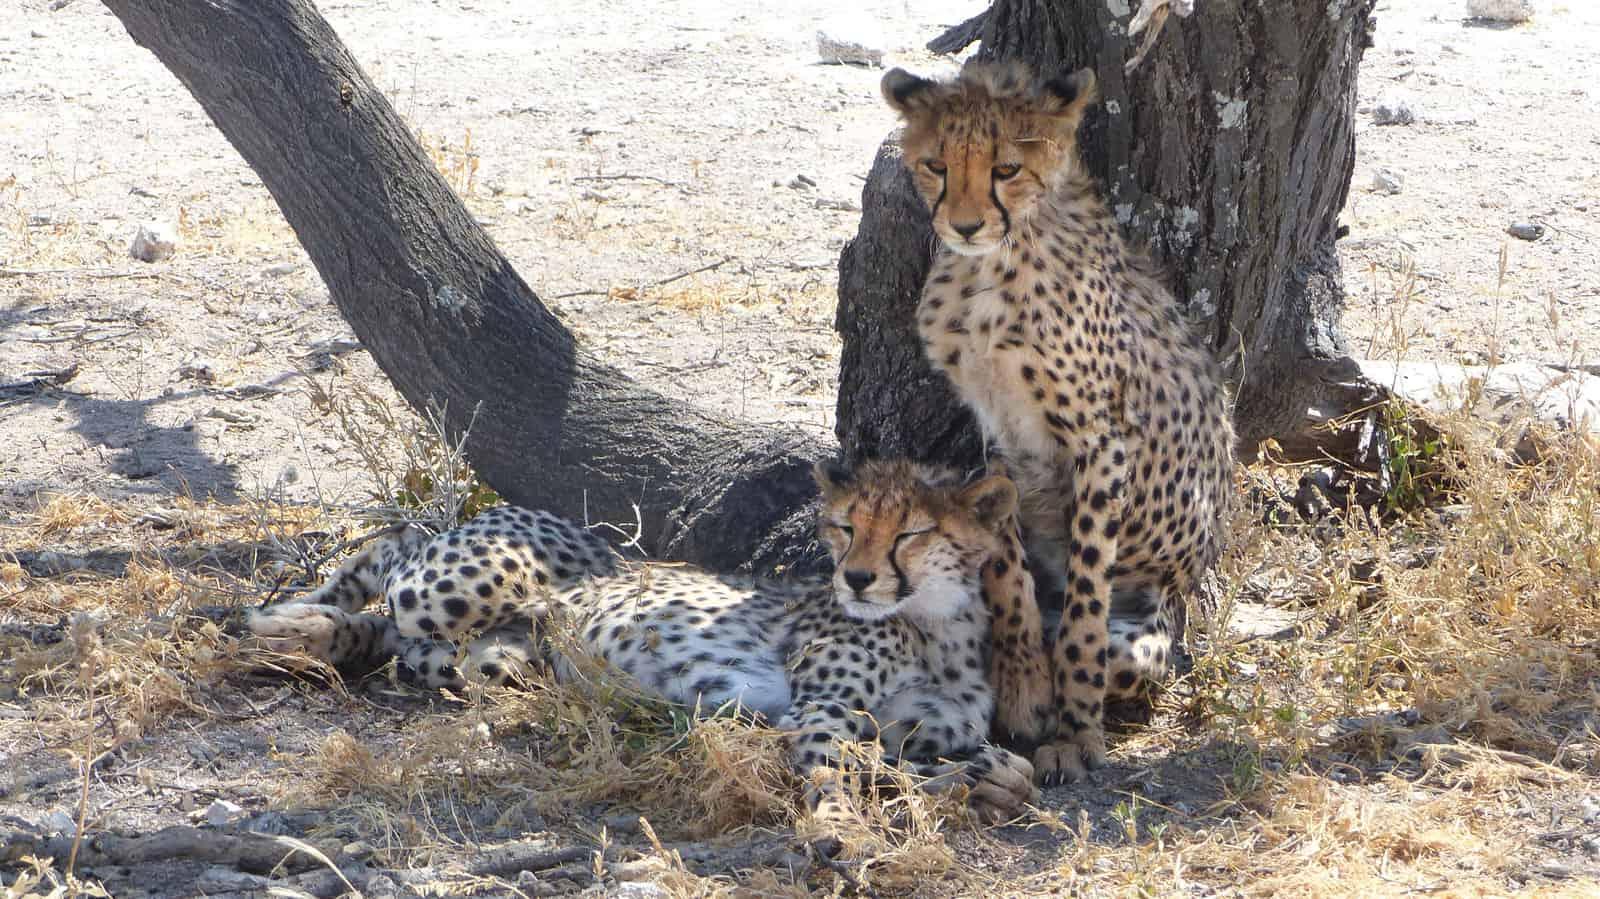 Cheetahs at Etosha, Namibia